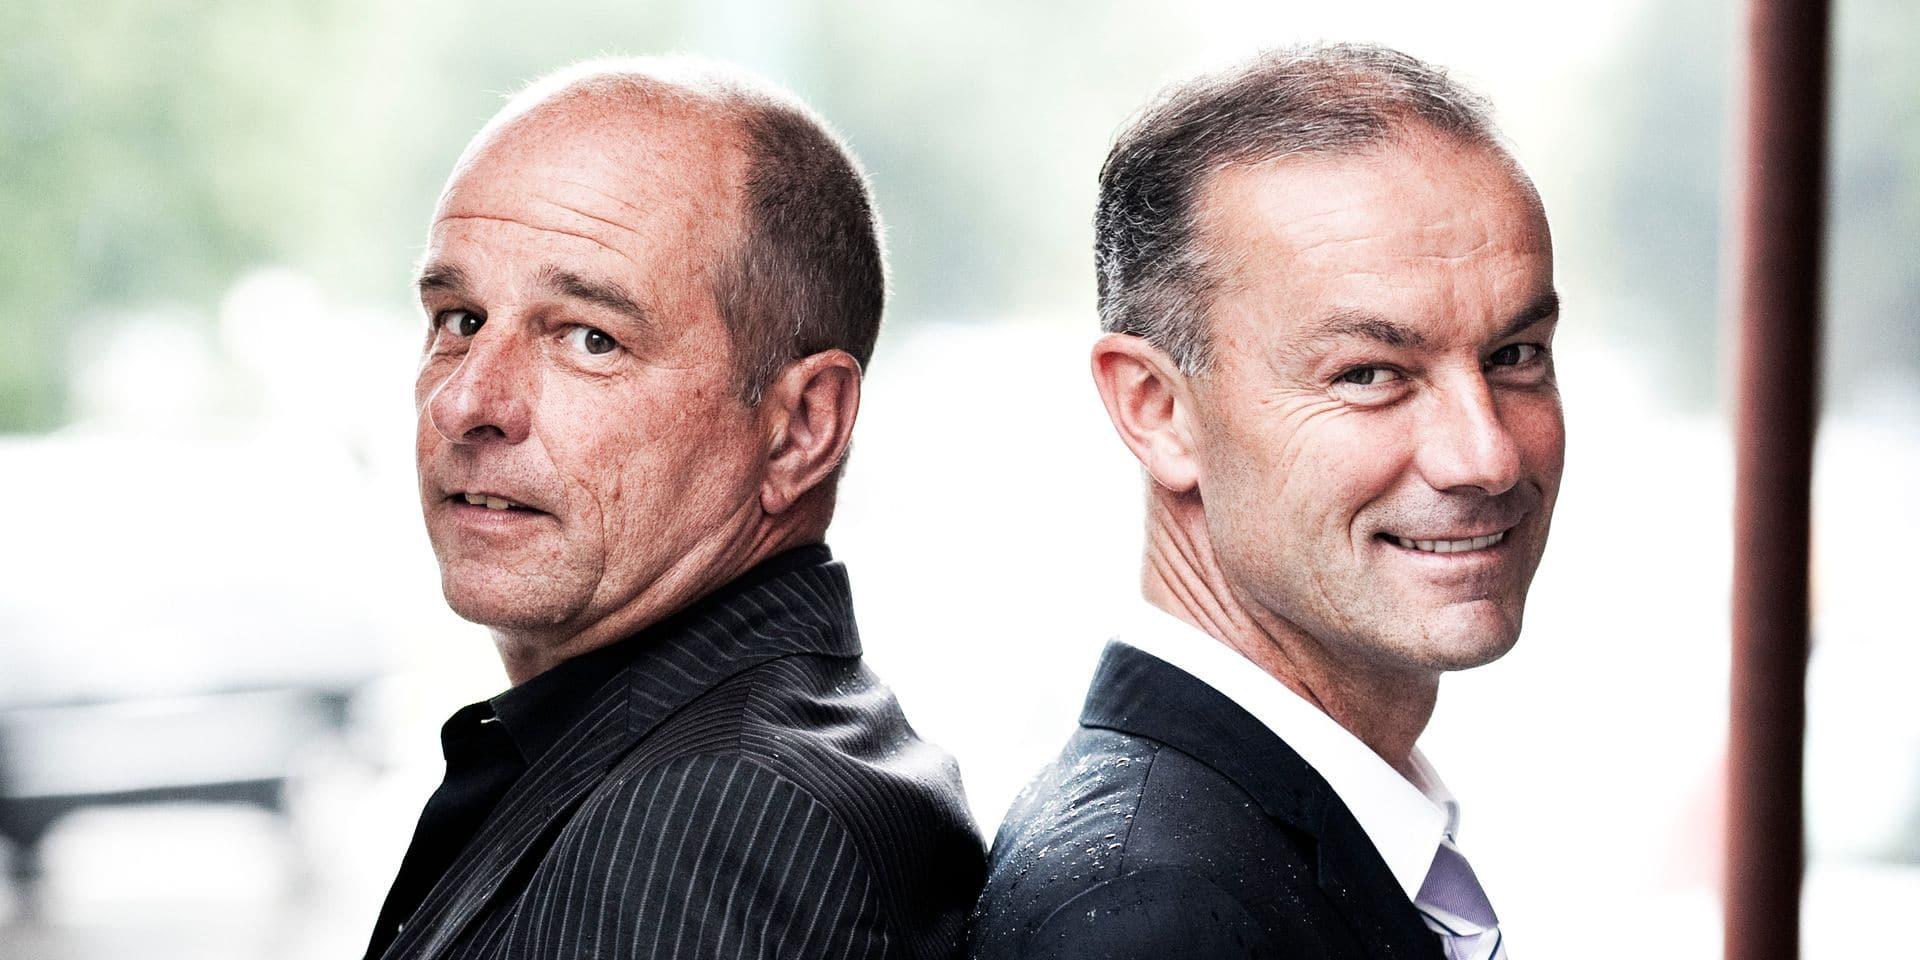 BELGIUM - RSC Anderlecht Trainers Kindermans & Gyselinckx